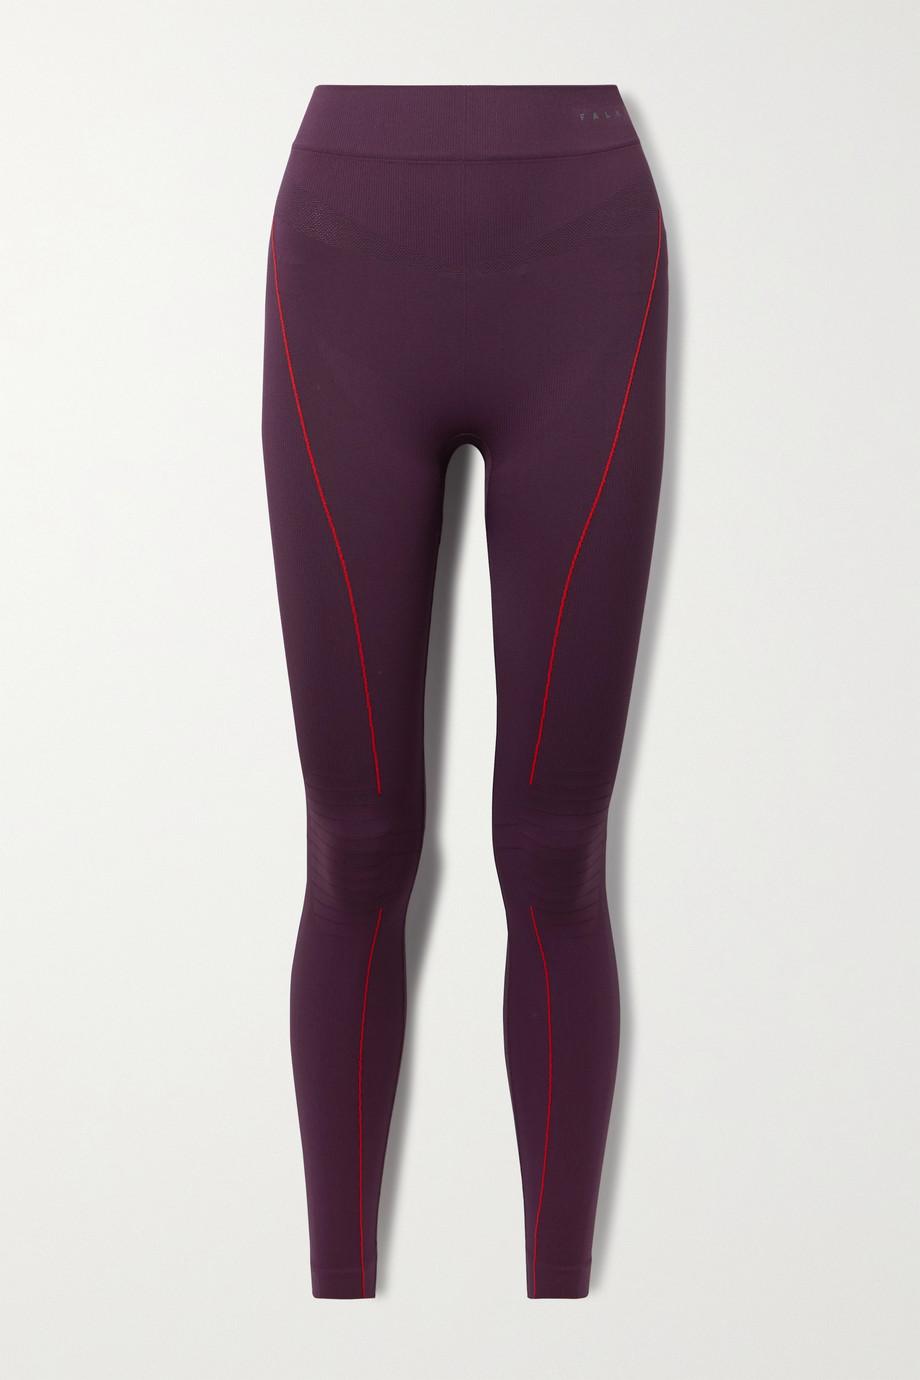 FALKE Ergonomic Sport System Legging en mailles stretch